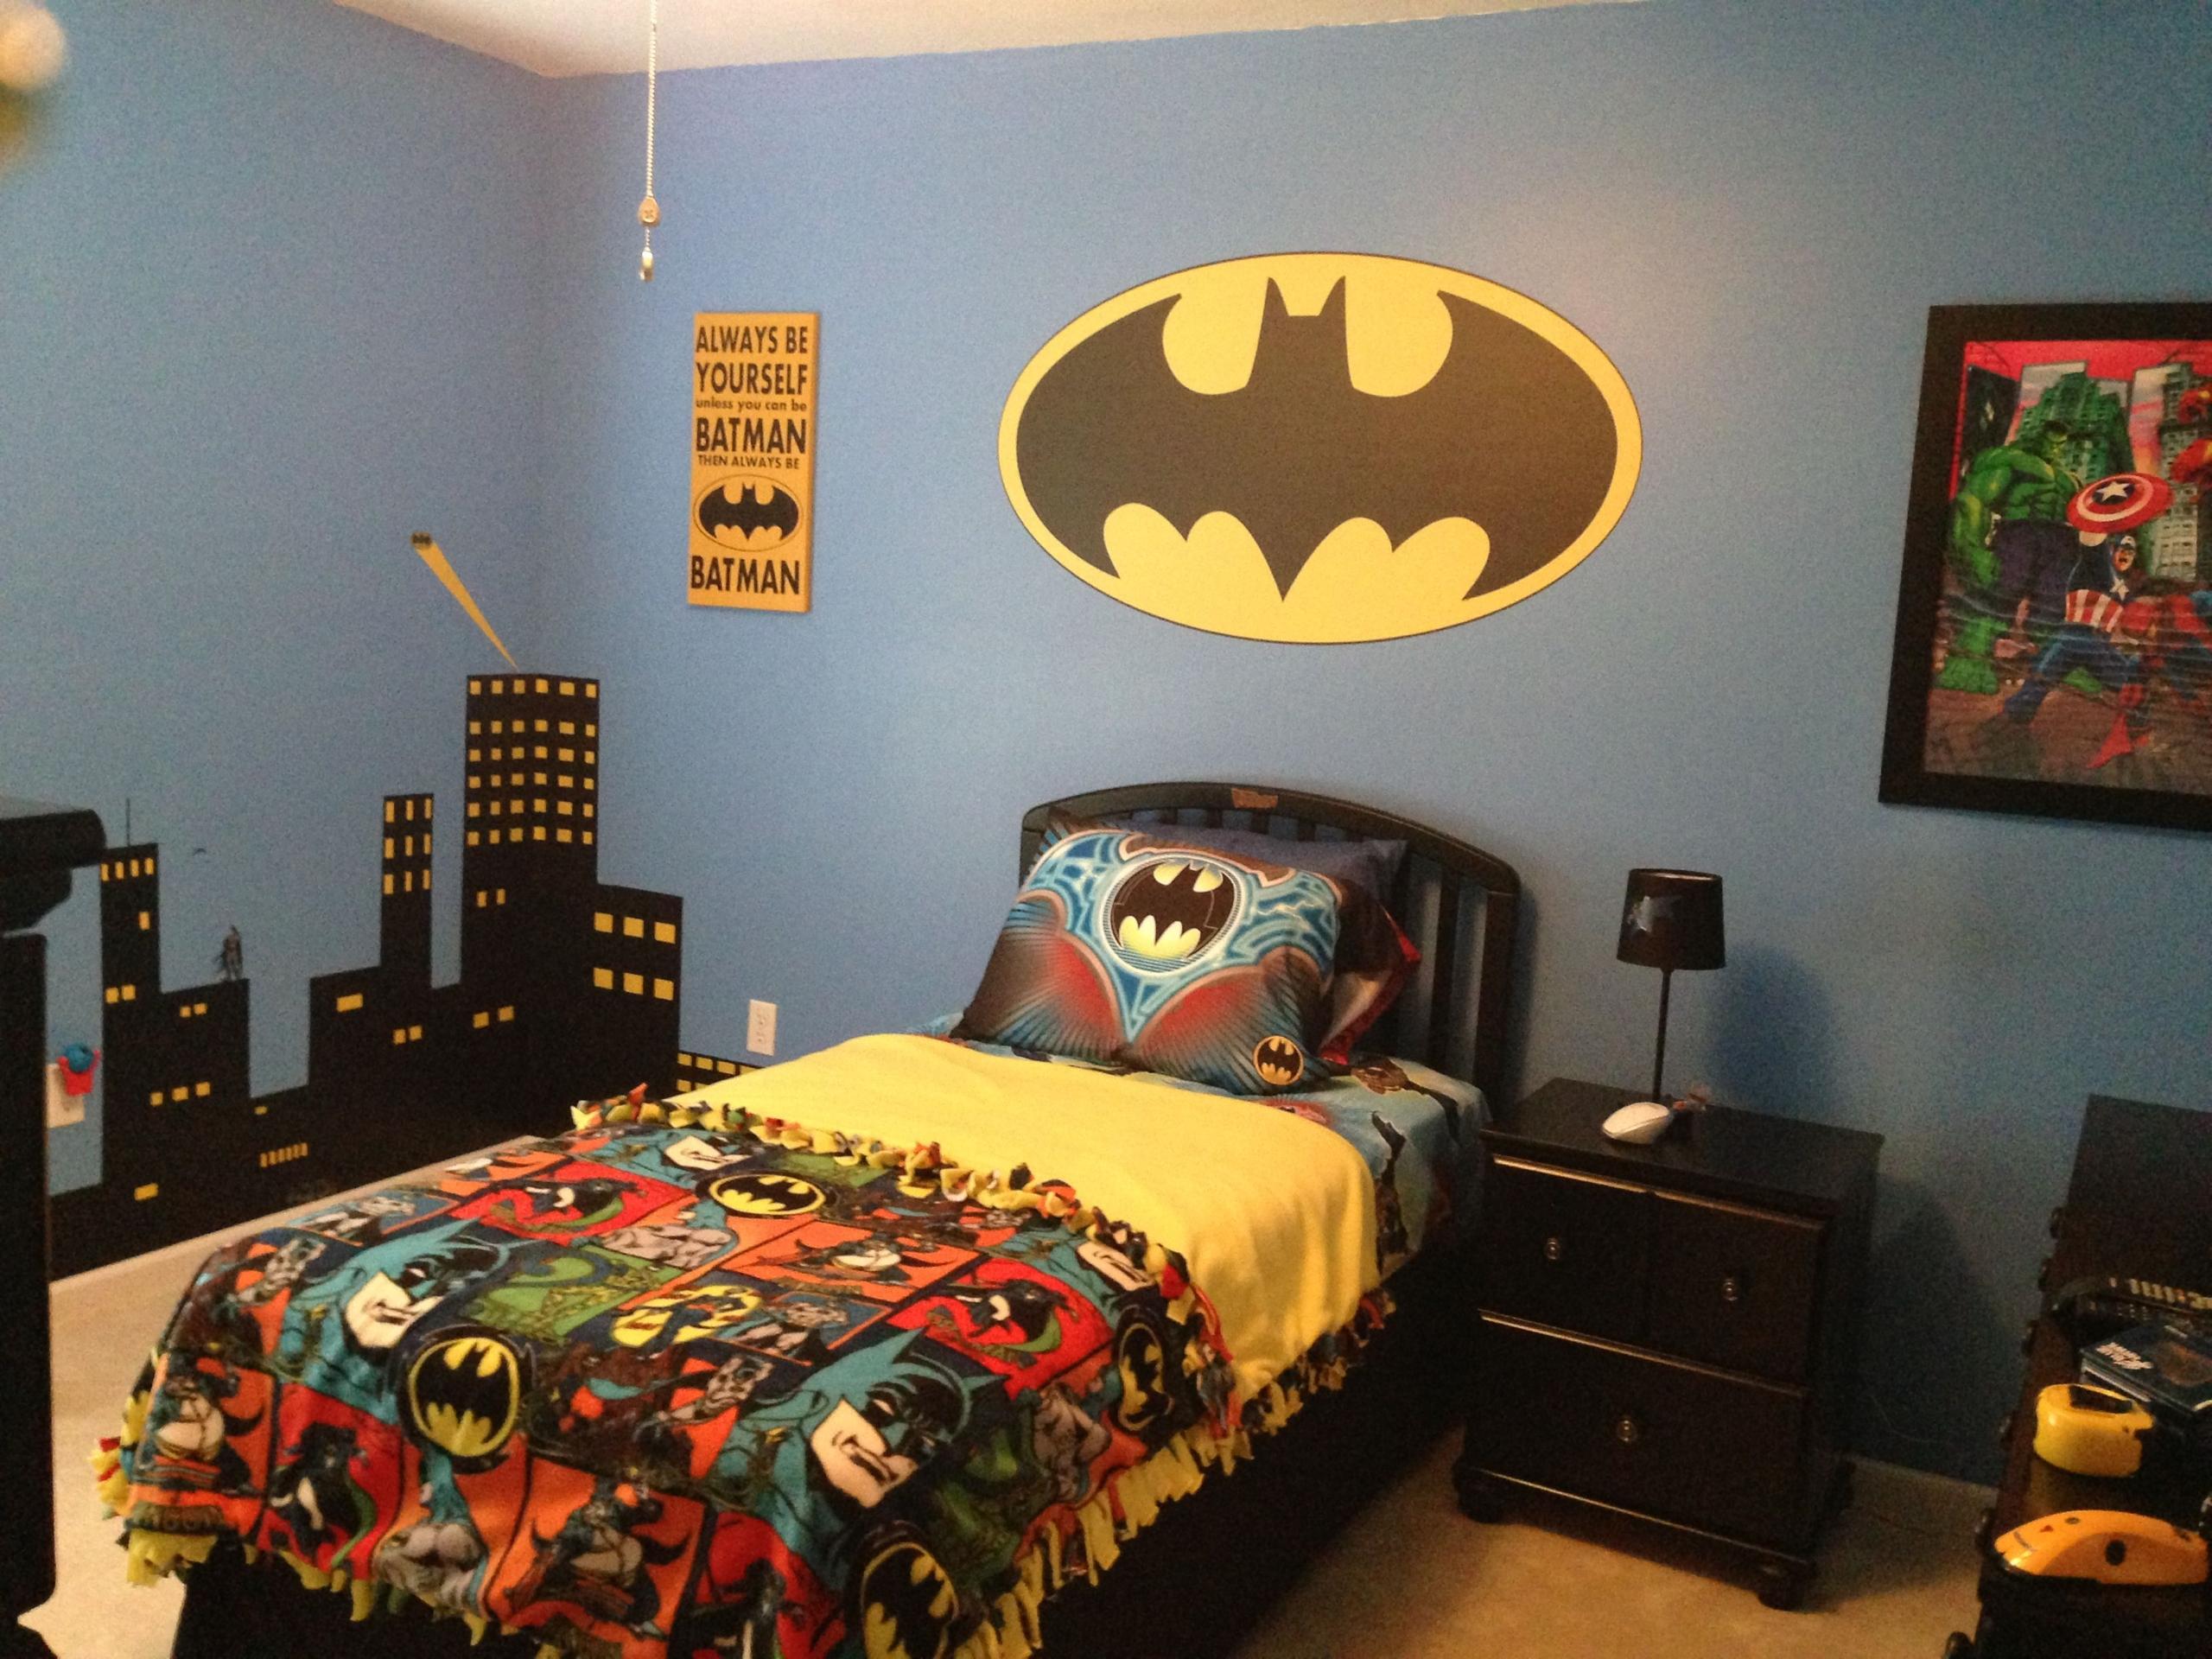 Batman Bedding And Bedroom Décor Ideas For Your Little .